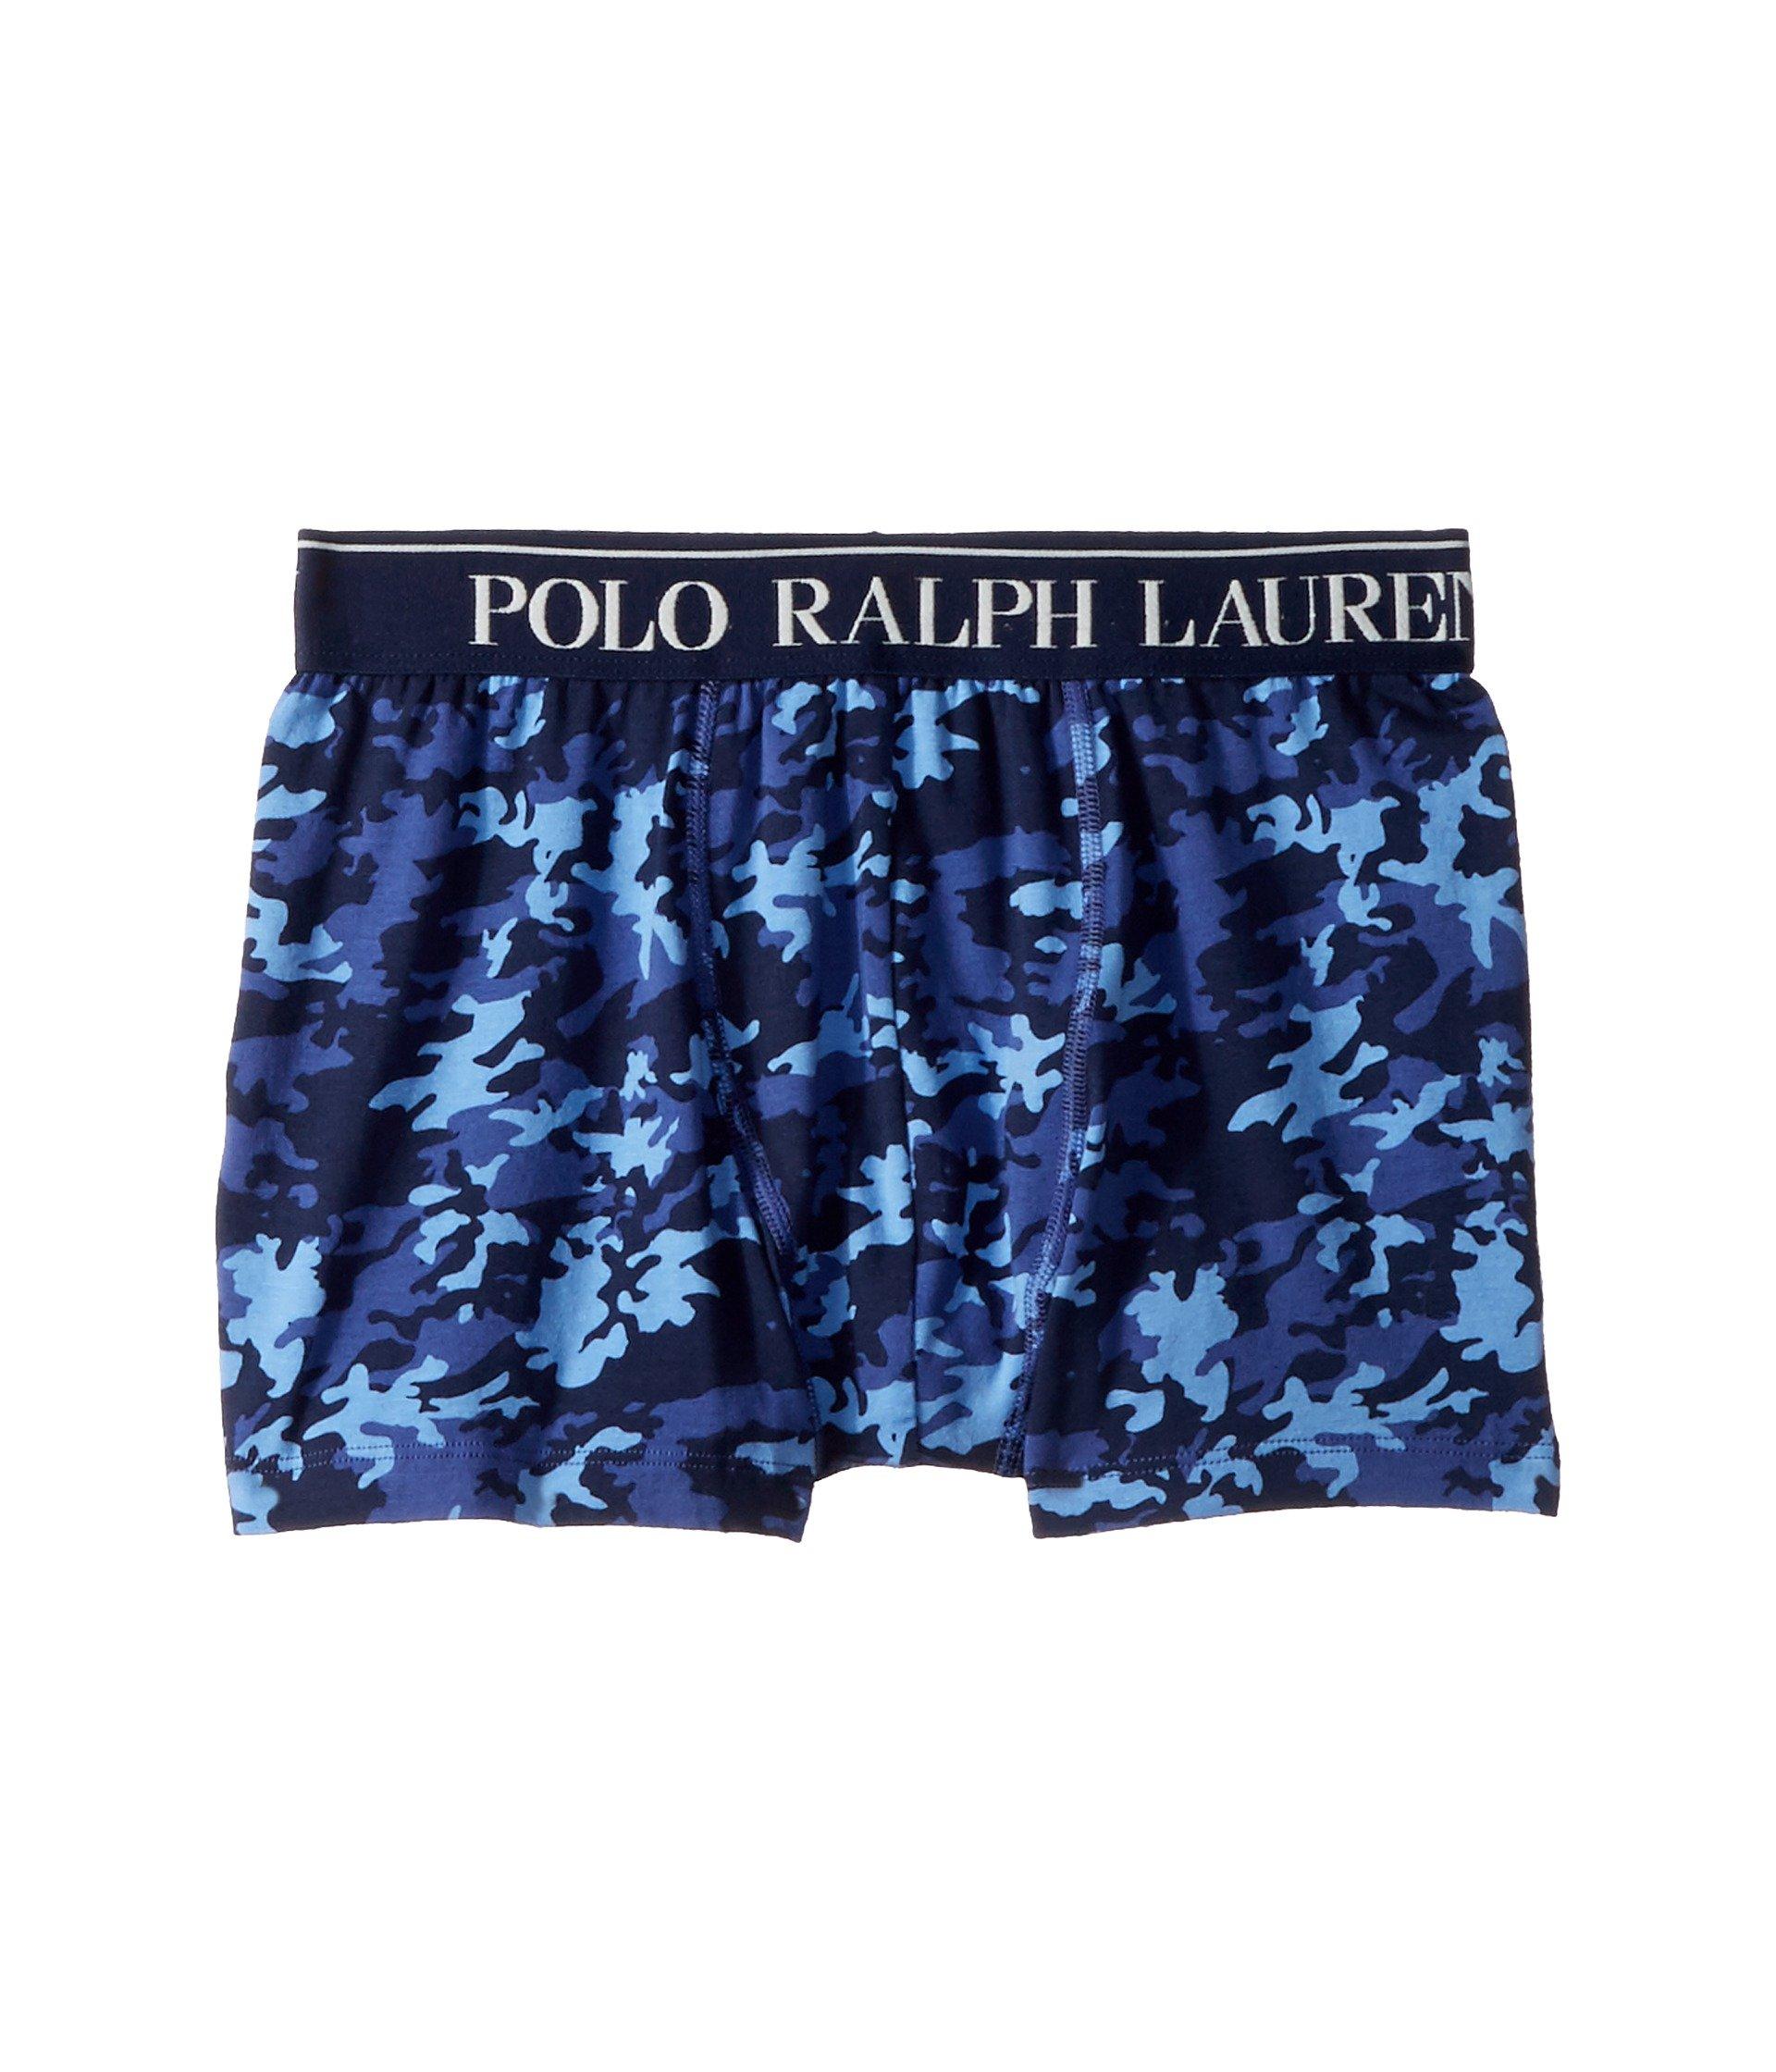 Ropa Interior para Hombre Polo Ralph Lauren Cotton Stretch Jersey Pouch Boxer Brief  + Polo Ralph Lauren en VeoyCompro.net